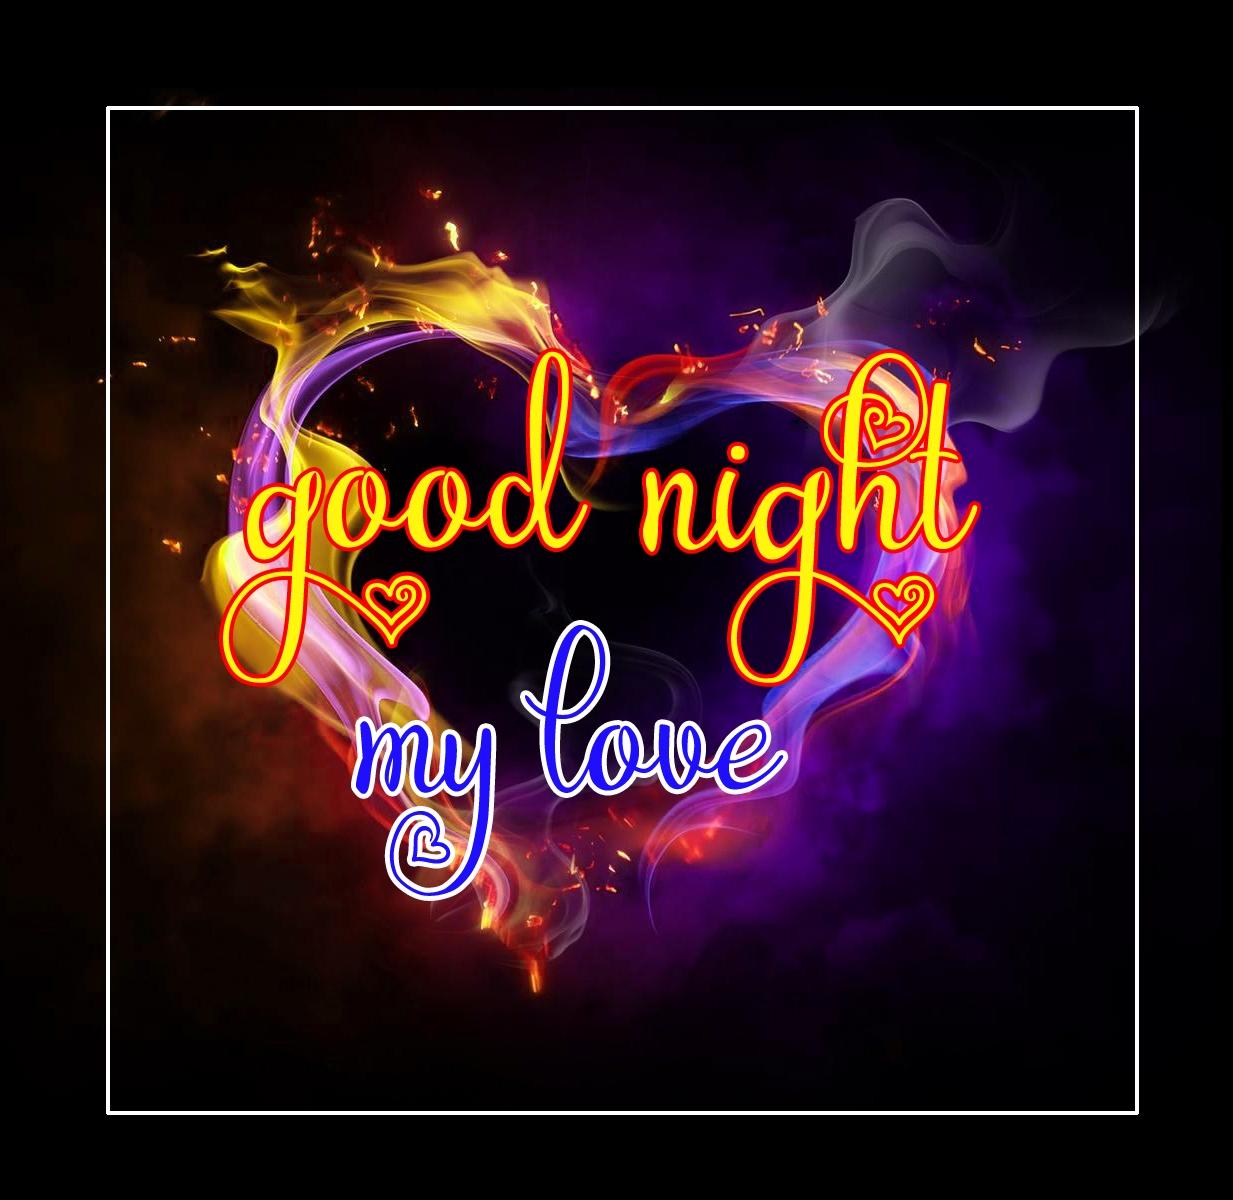 Free good night Images 57